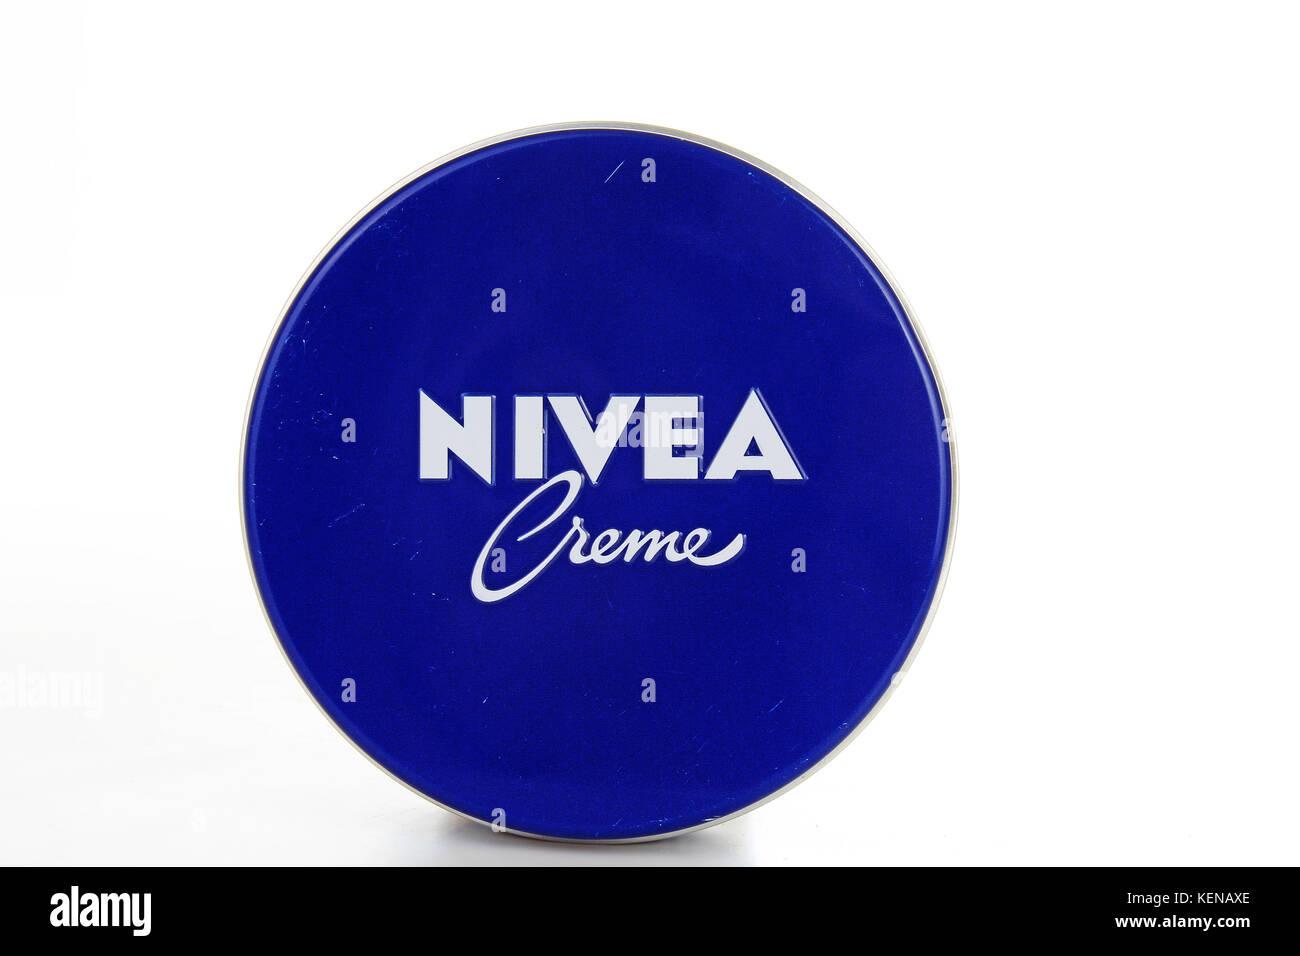 Nivea Skincare Review 2018: Skin Care Now With Nivea